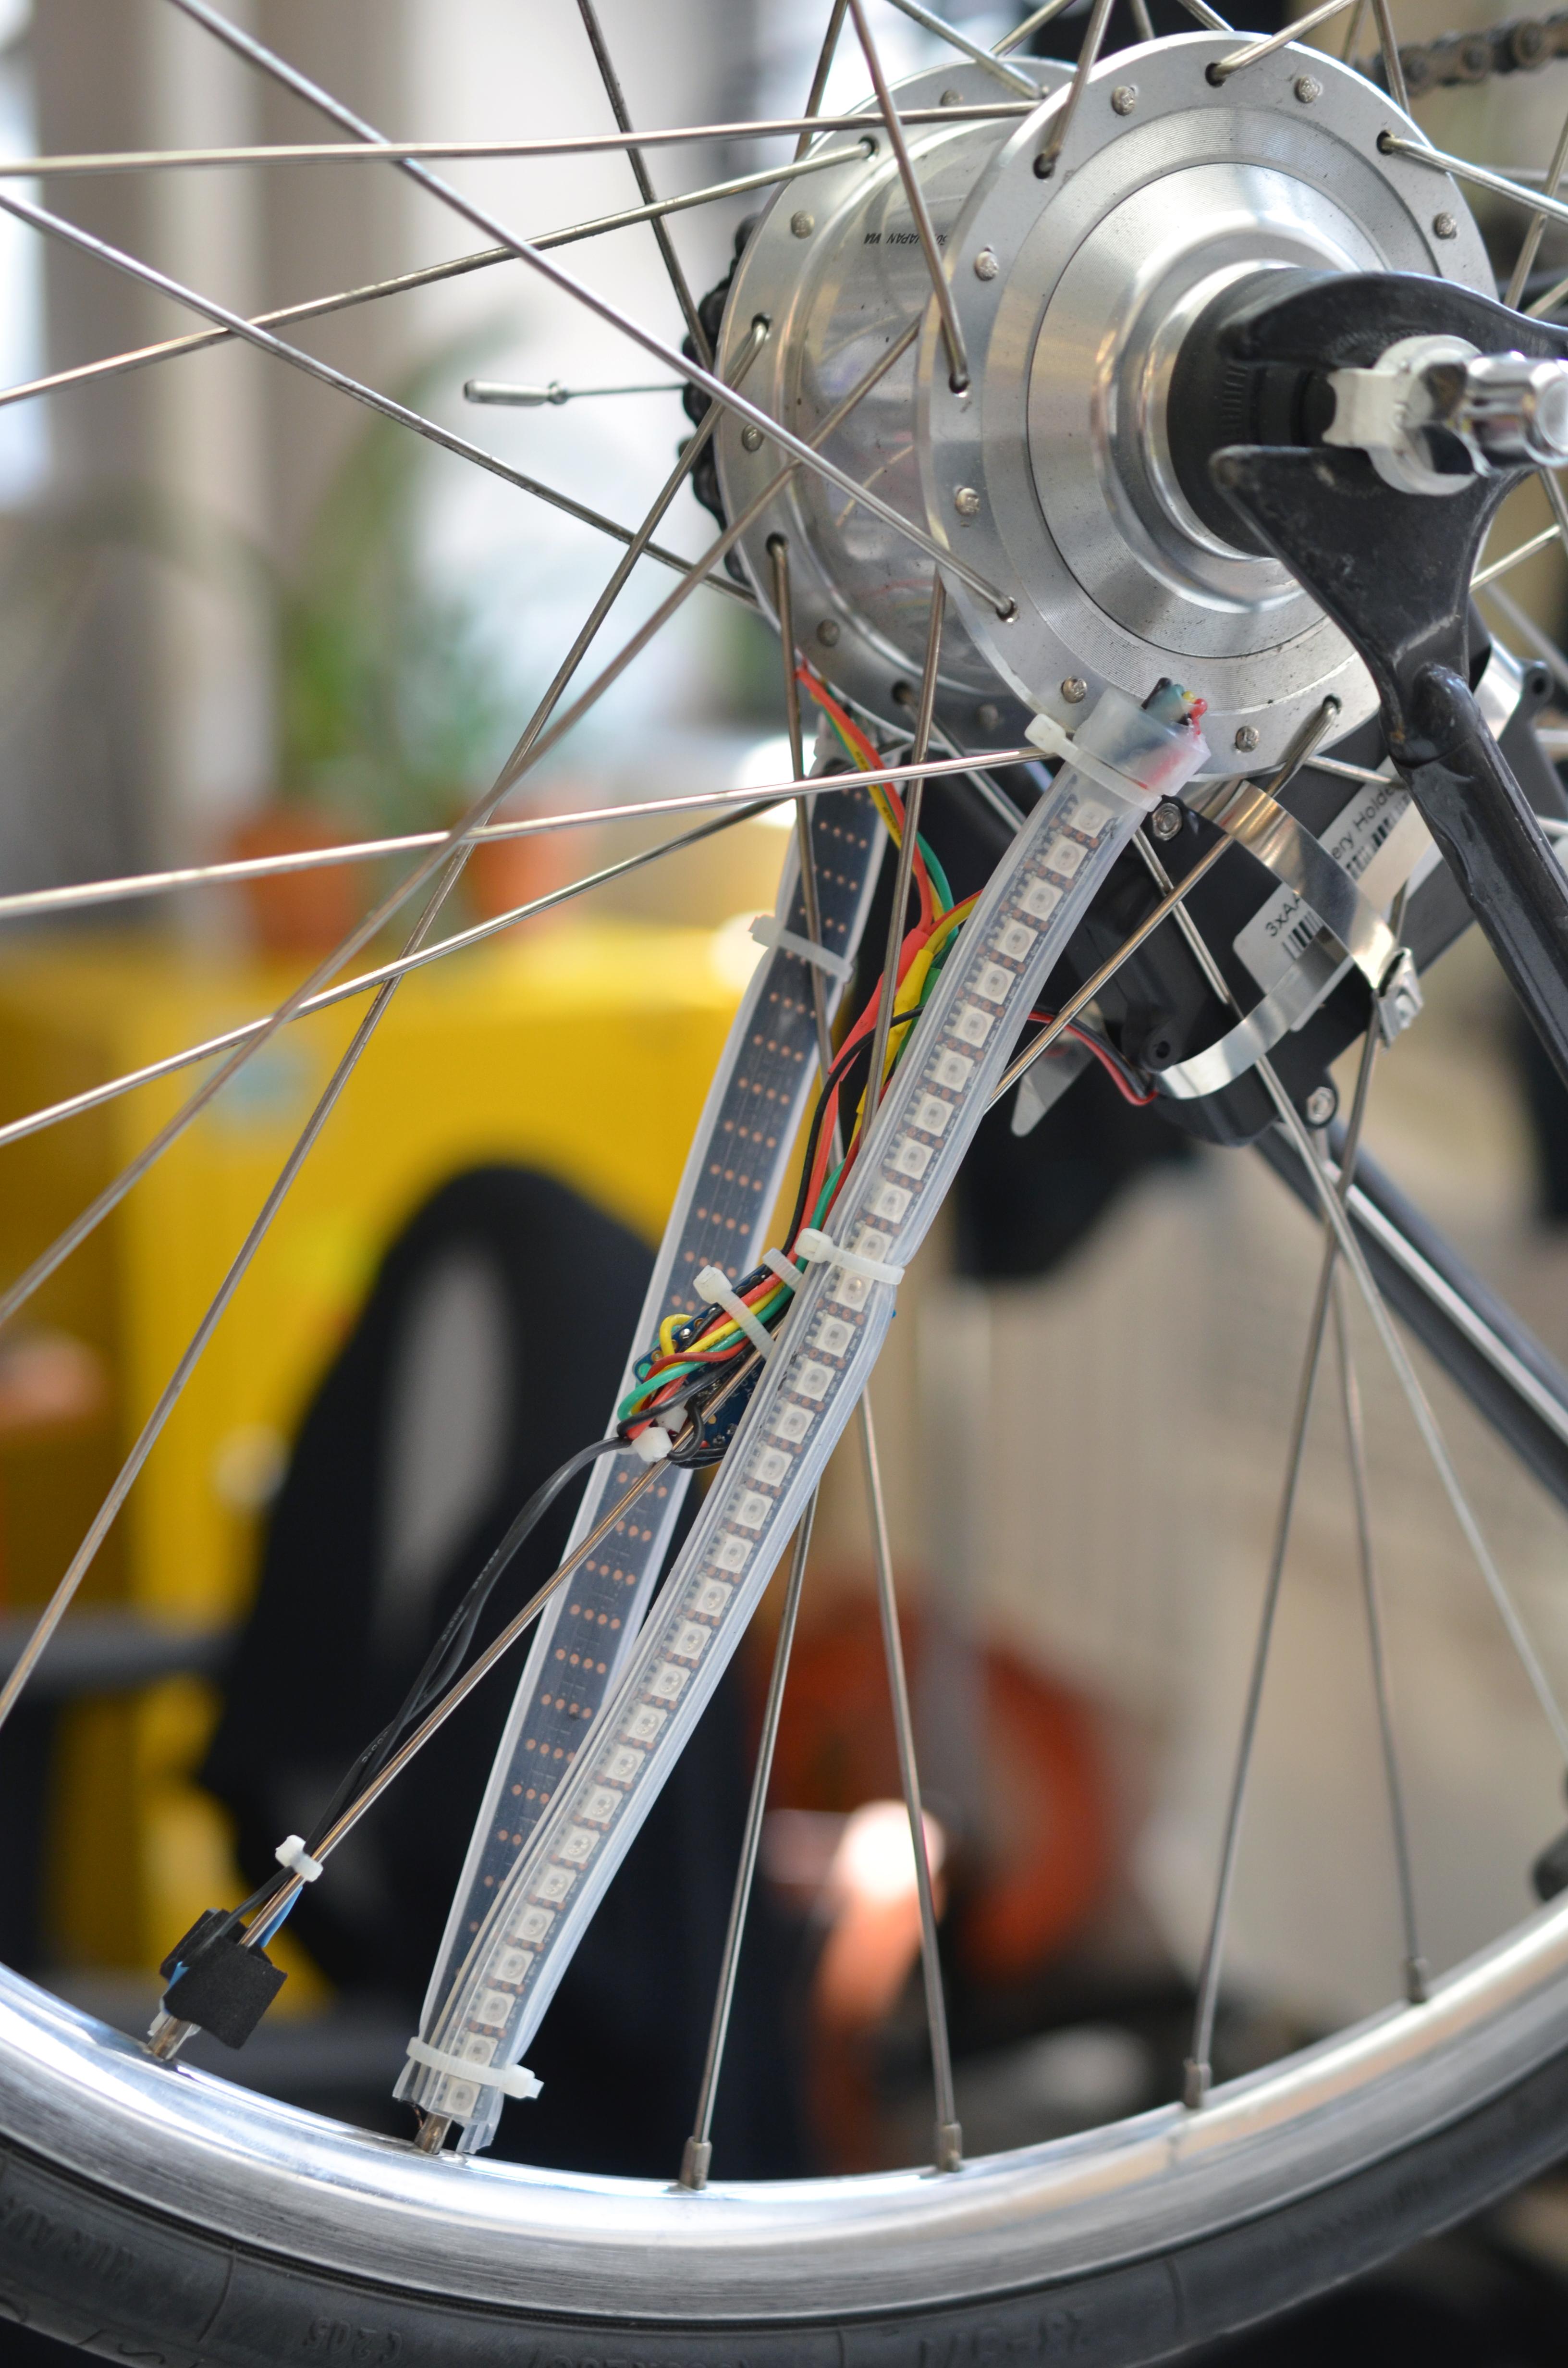 projects_pov-bike-wheel-adafruit-circuit-on-wheel.jpg